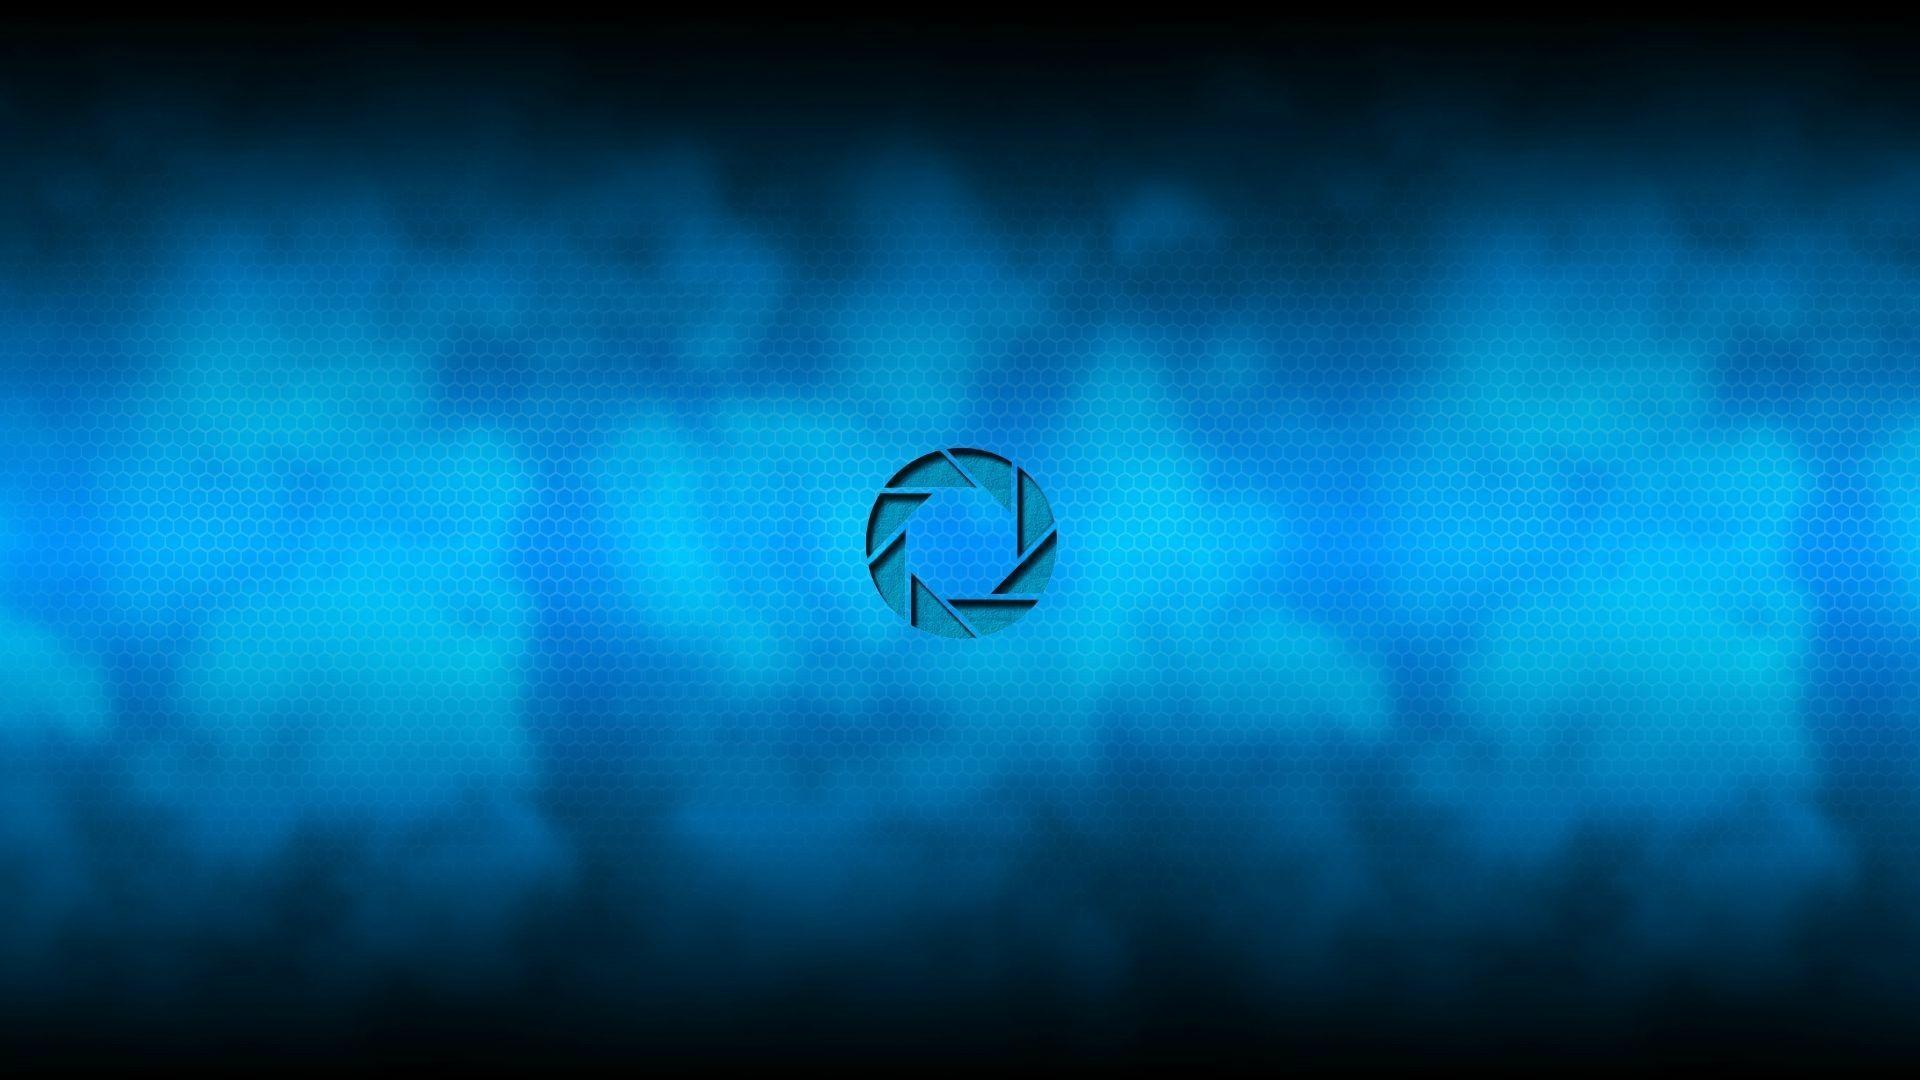 Logo Aperture Science, blue background